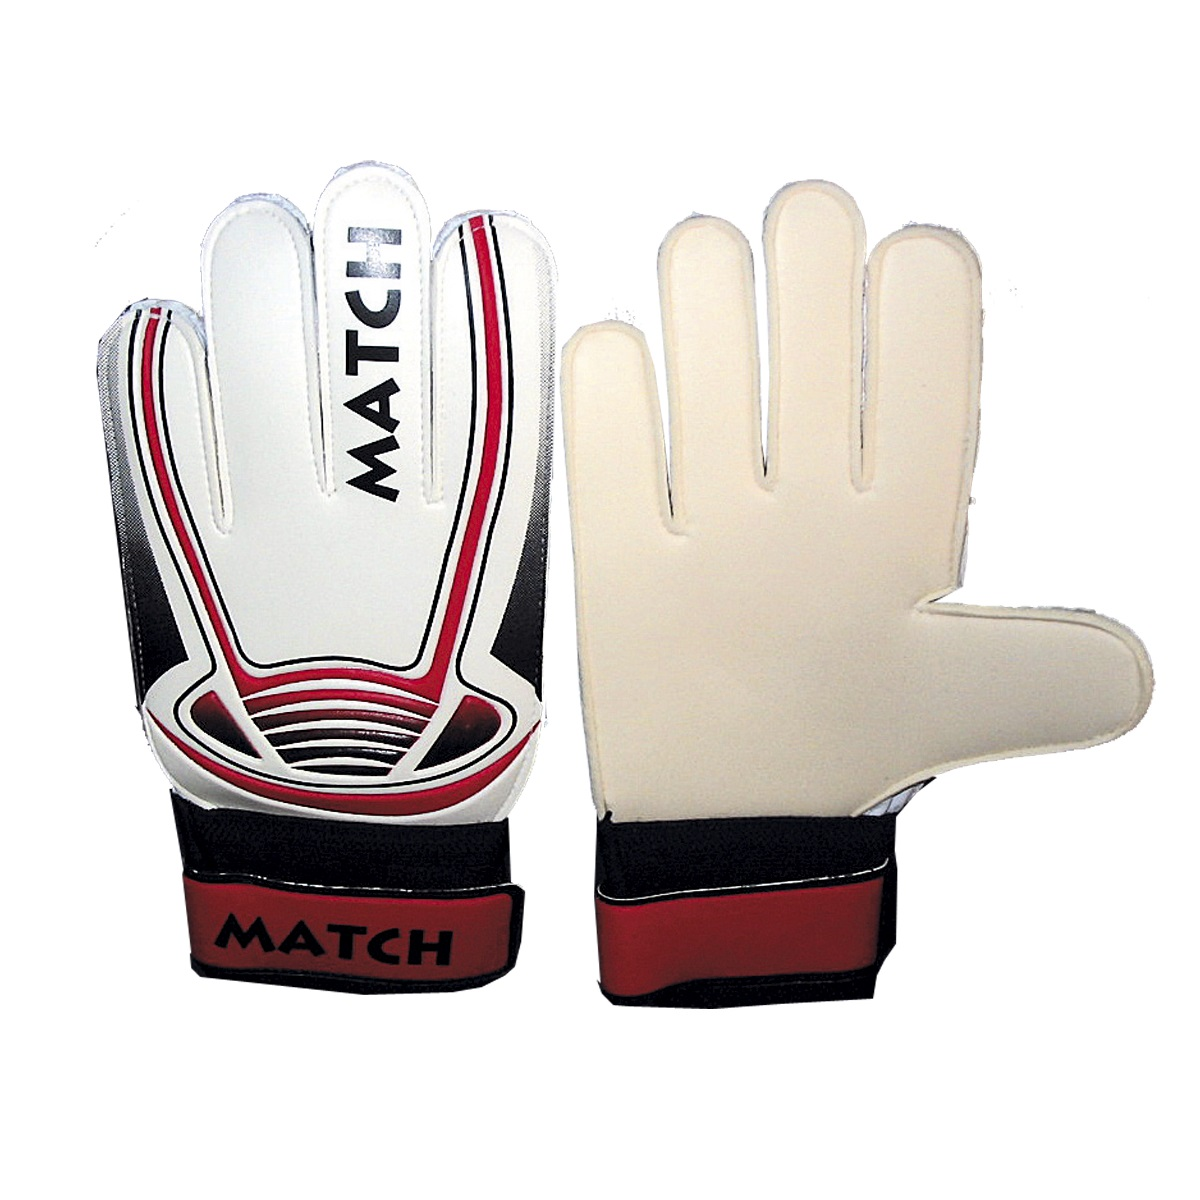 Fotbalové rukavice SPARTAN Match - XL